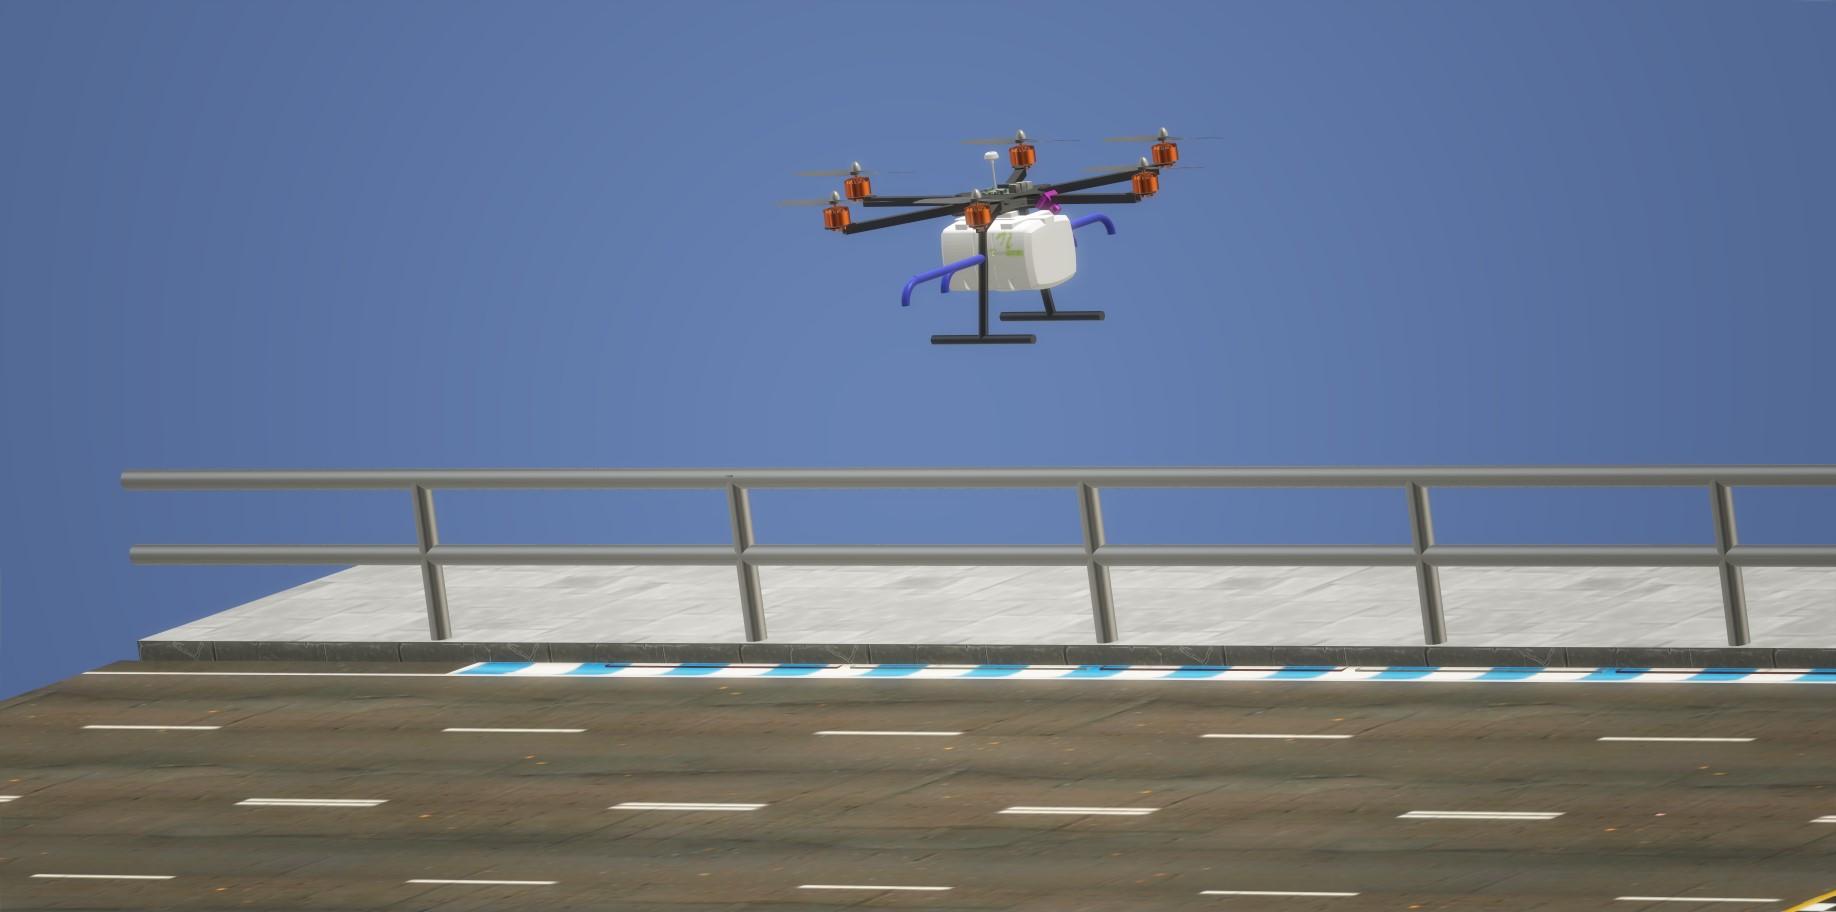 nevon COVID sanitization drone